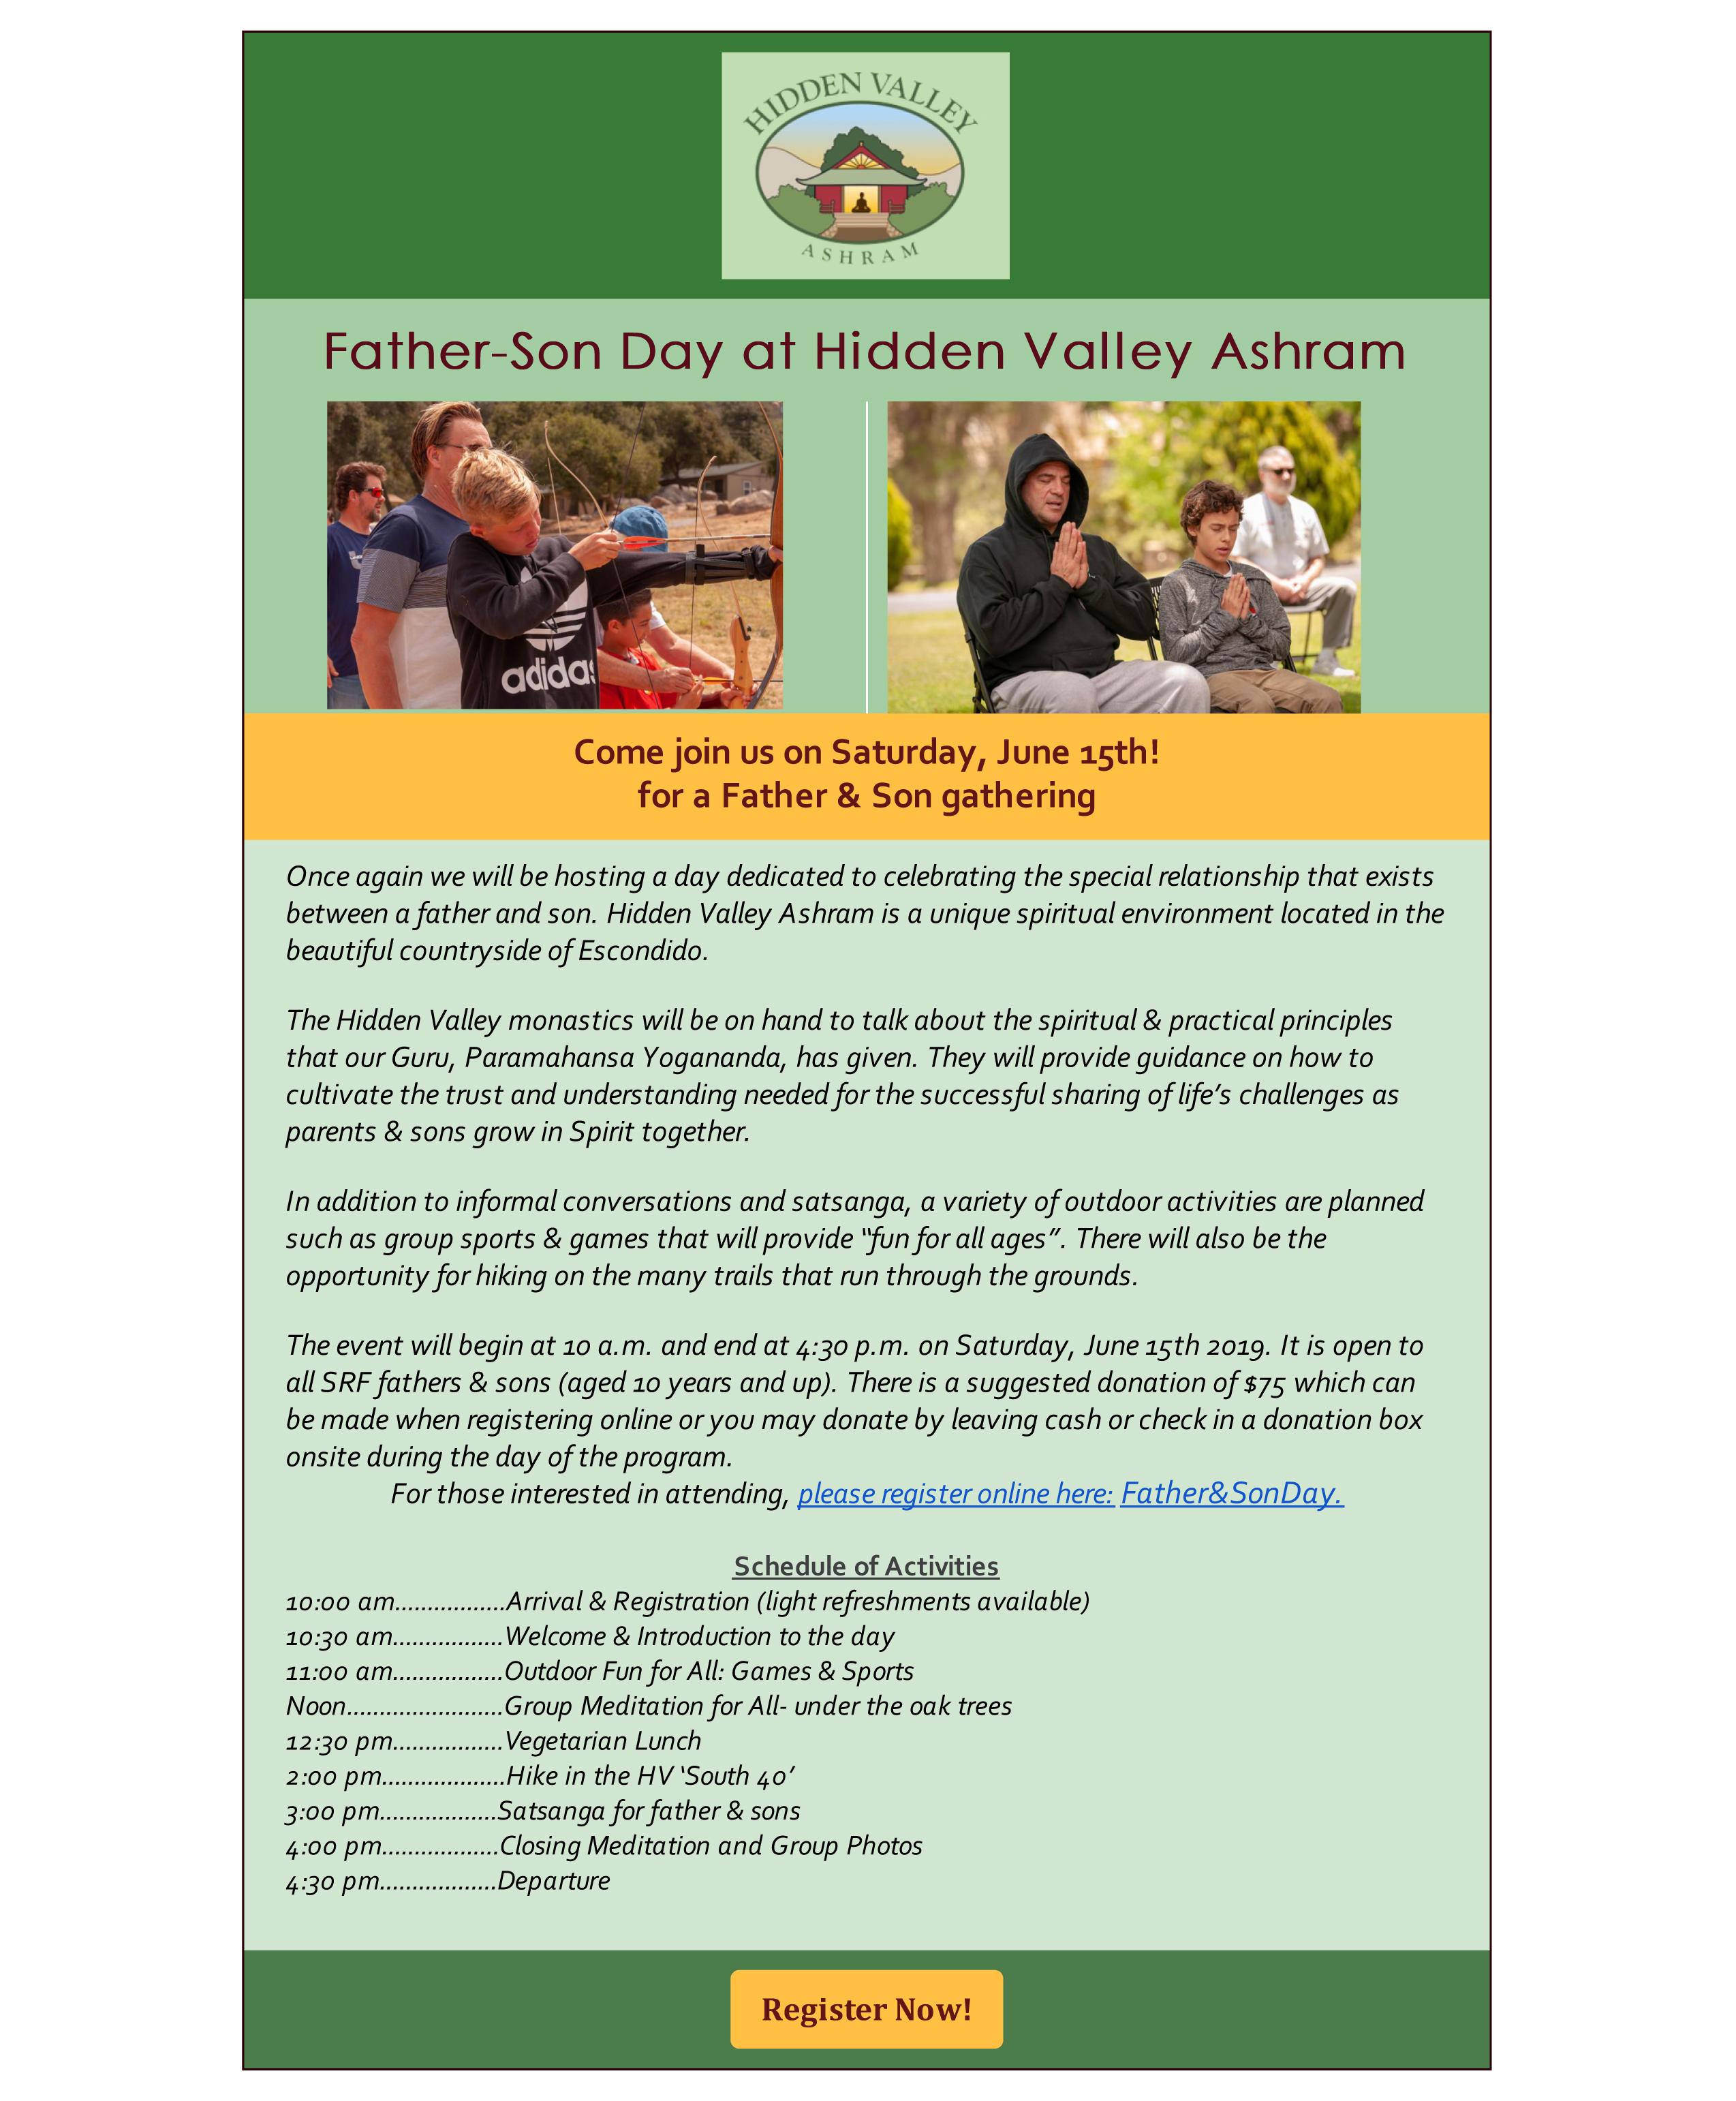 Father-Son Day Saturday, June 15 | Hidden Valley Ashram